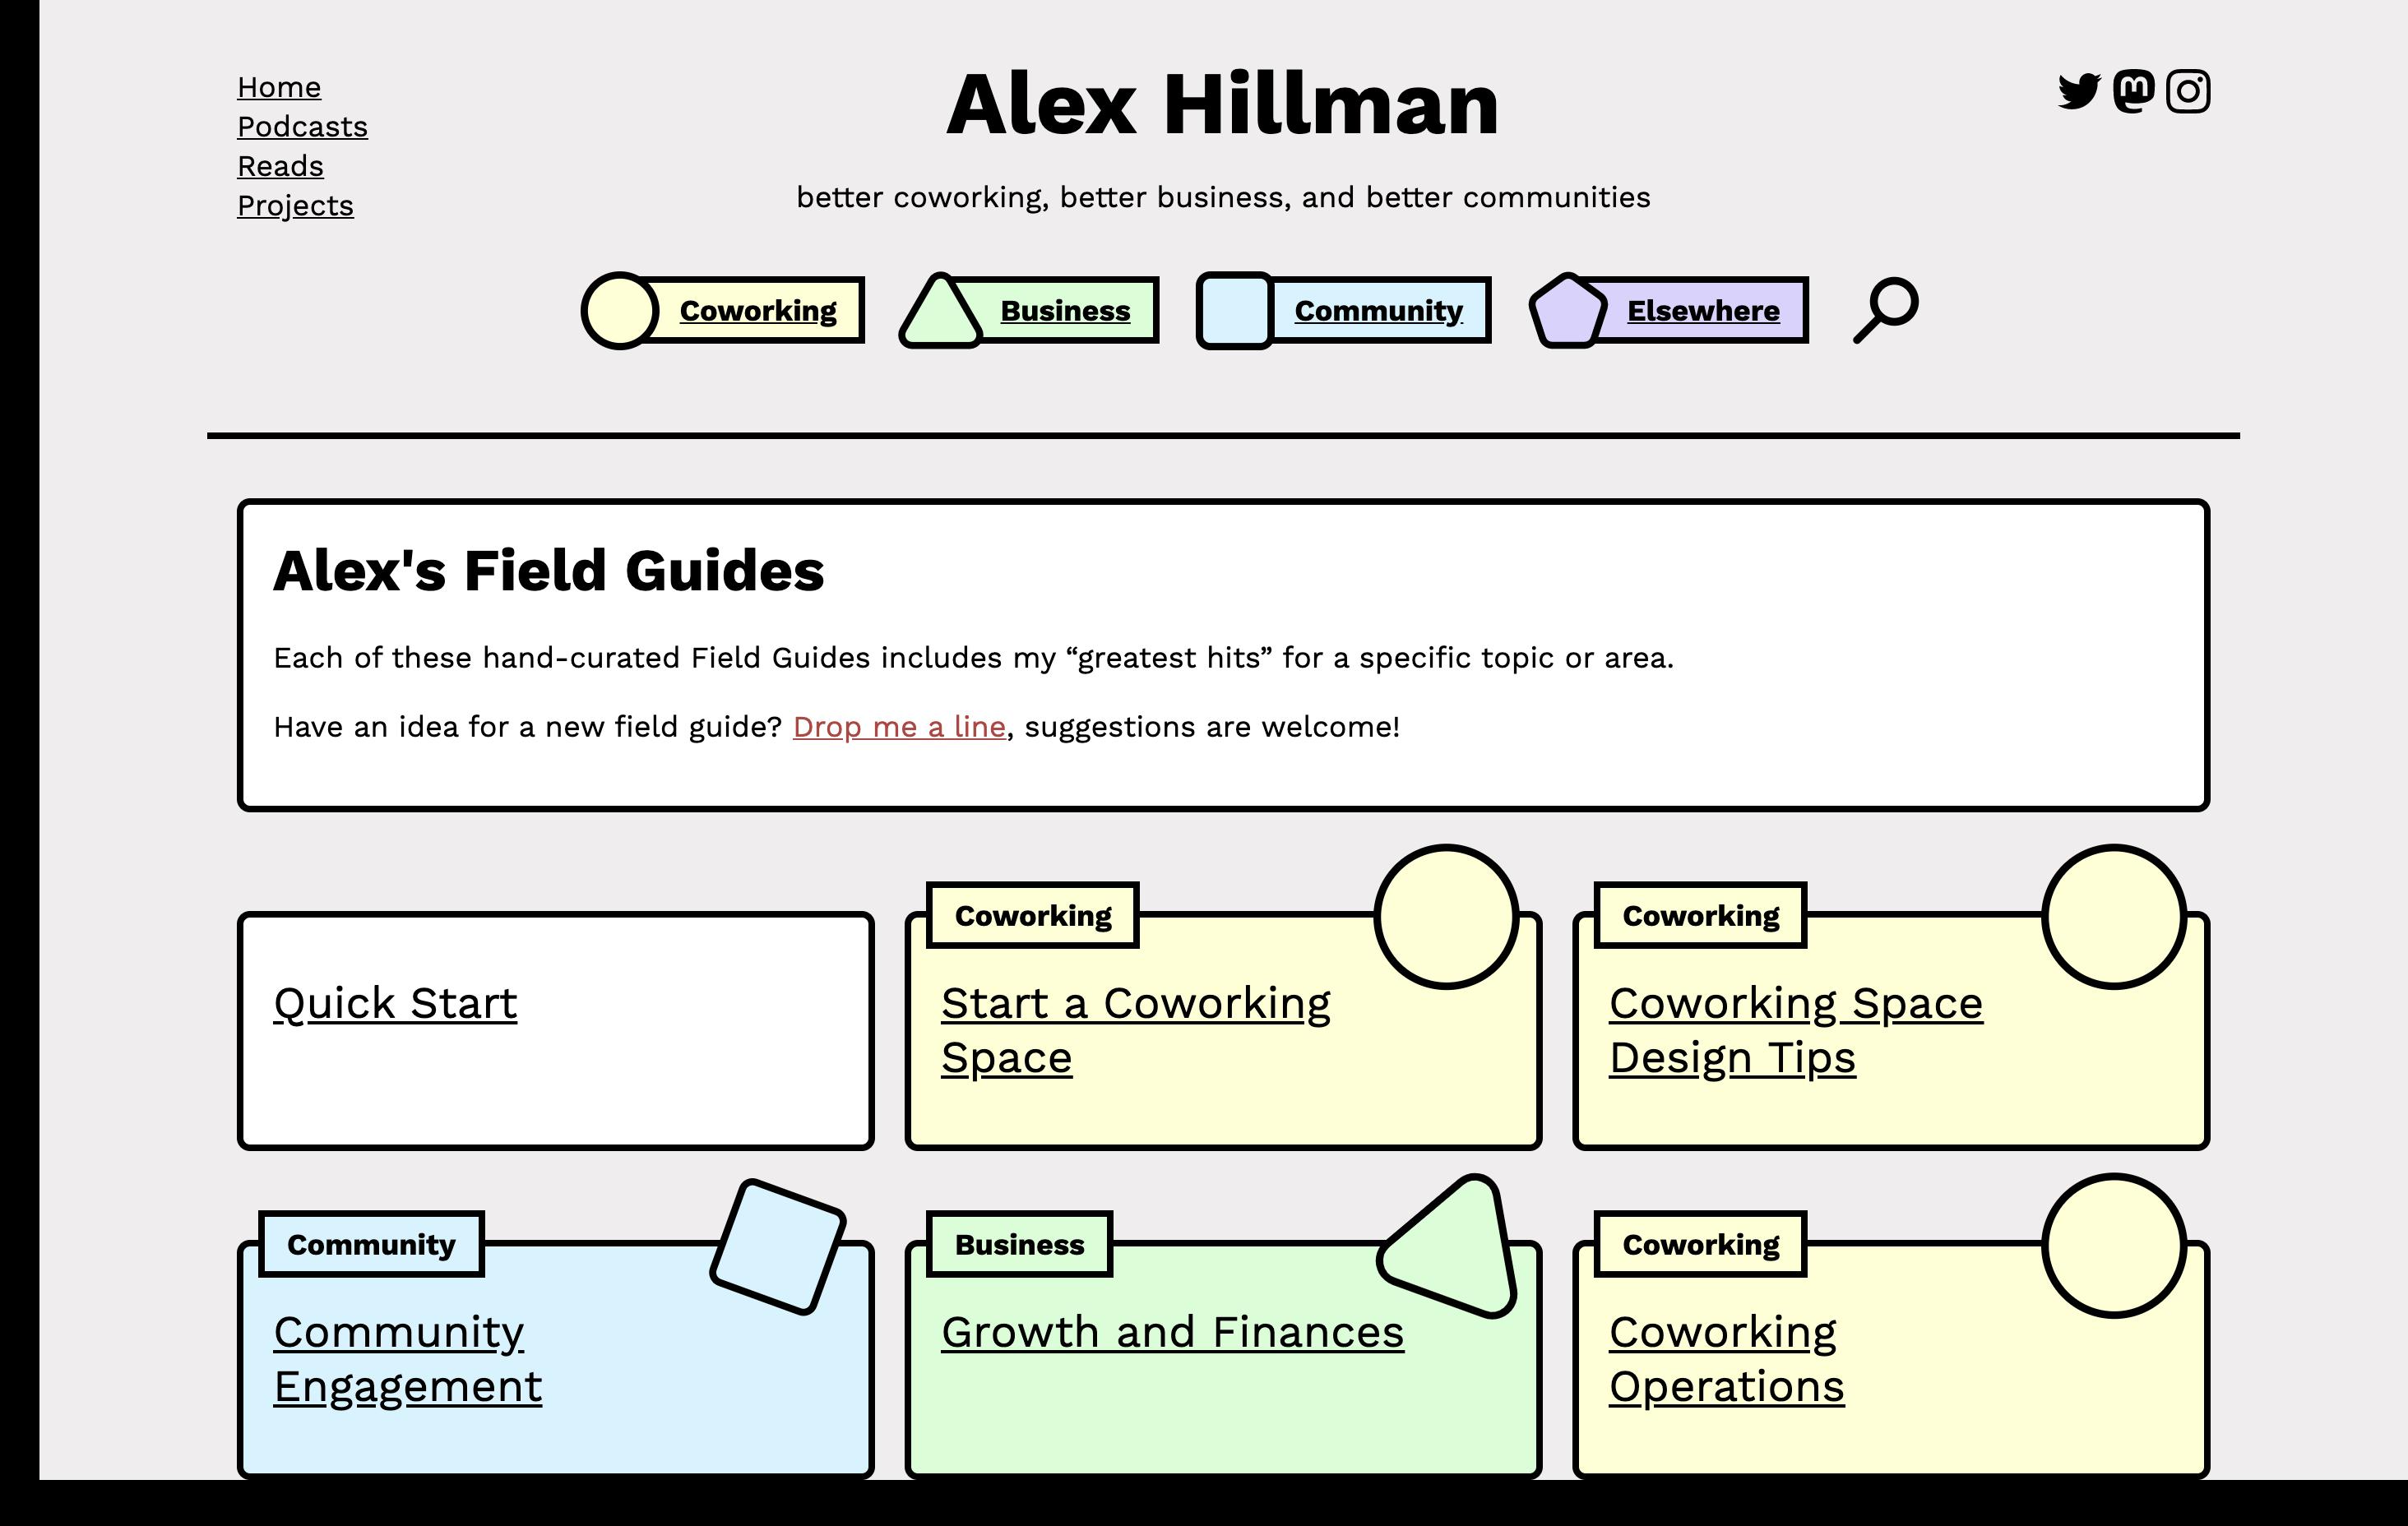 alex hillman field guides